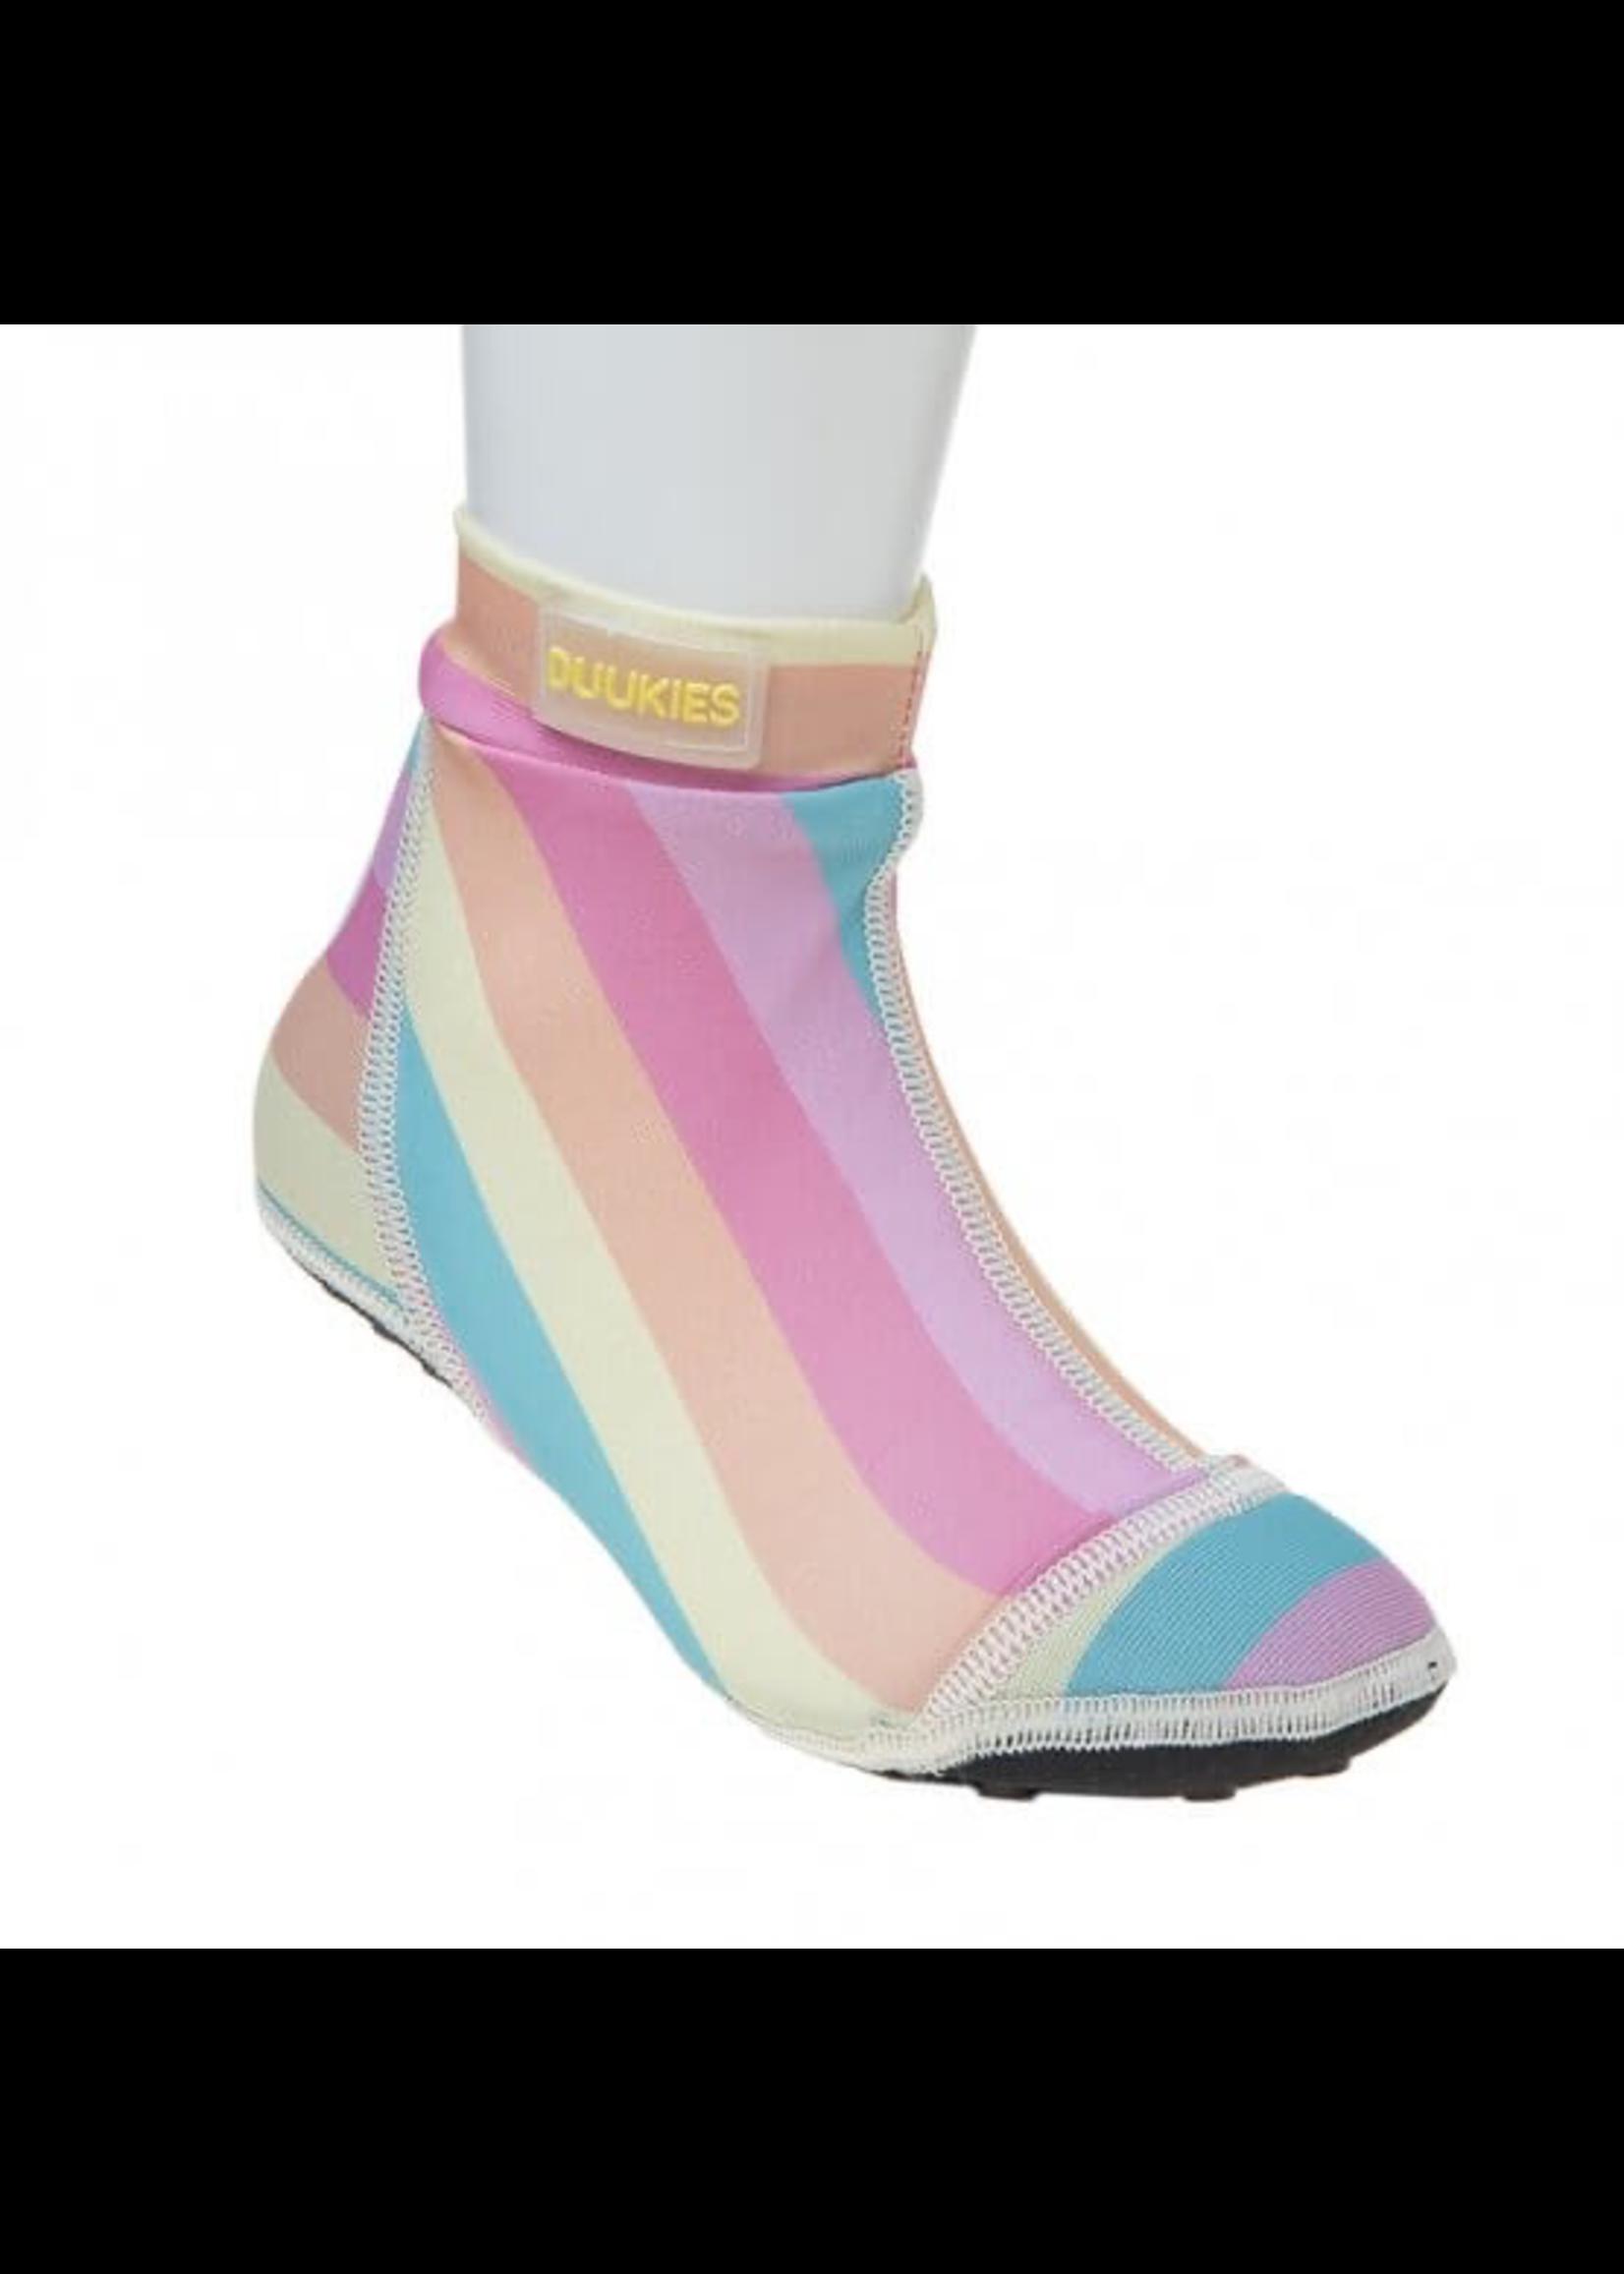 Duukies Duukies, Beach Socks for Girl - P-60989